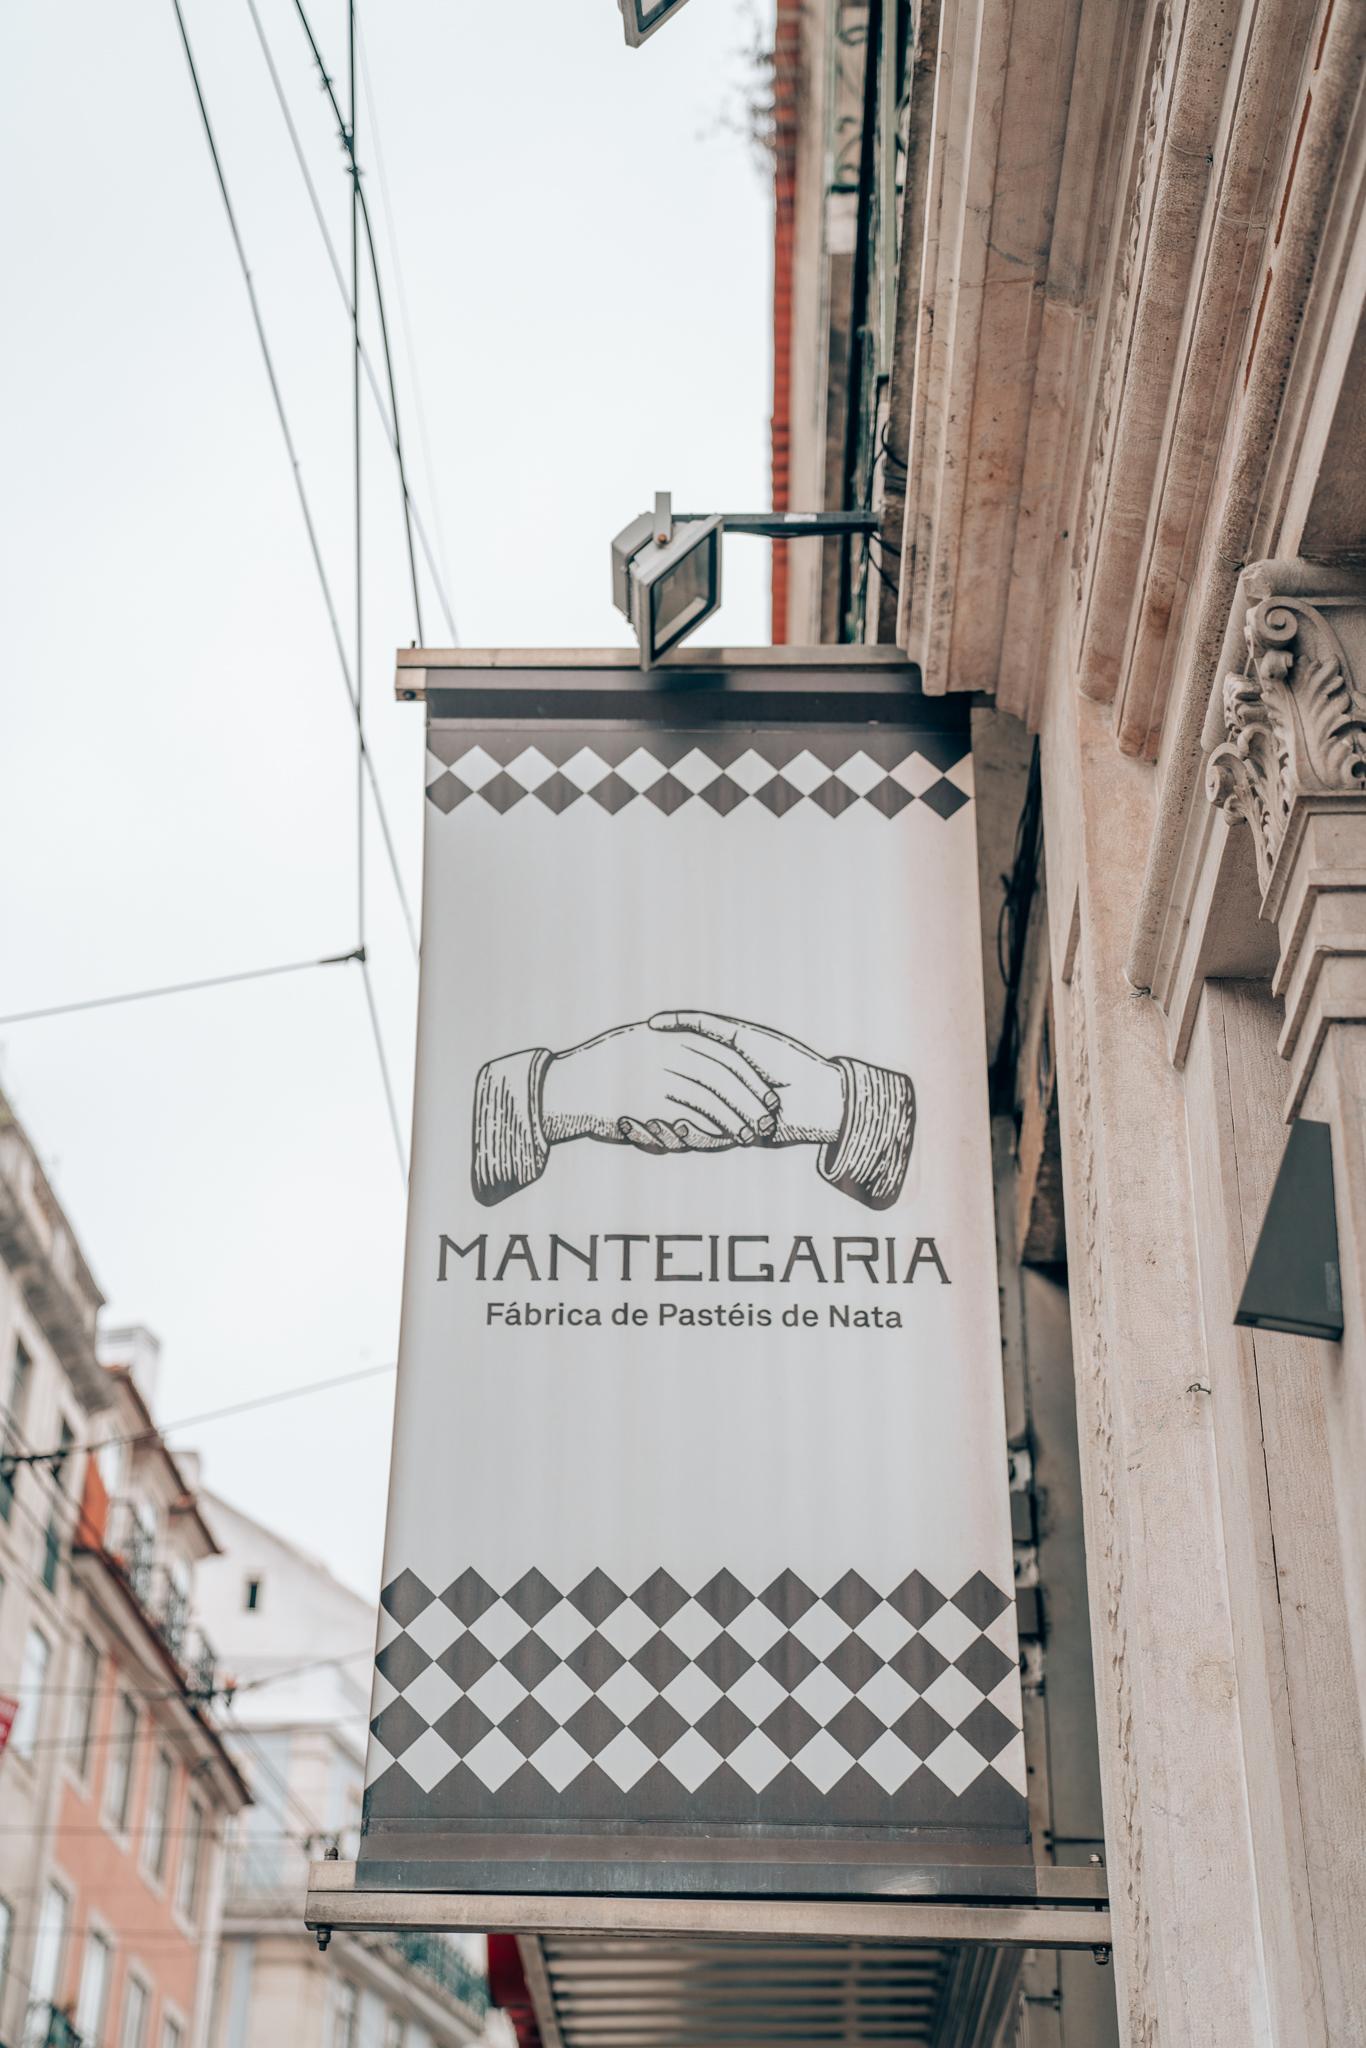 Manteigaria Best Egg Tarts in Lisbon